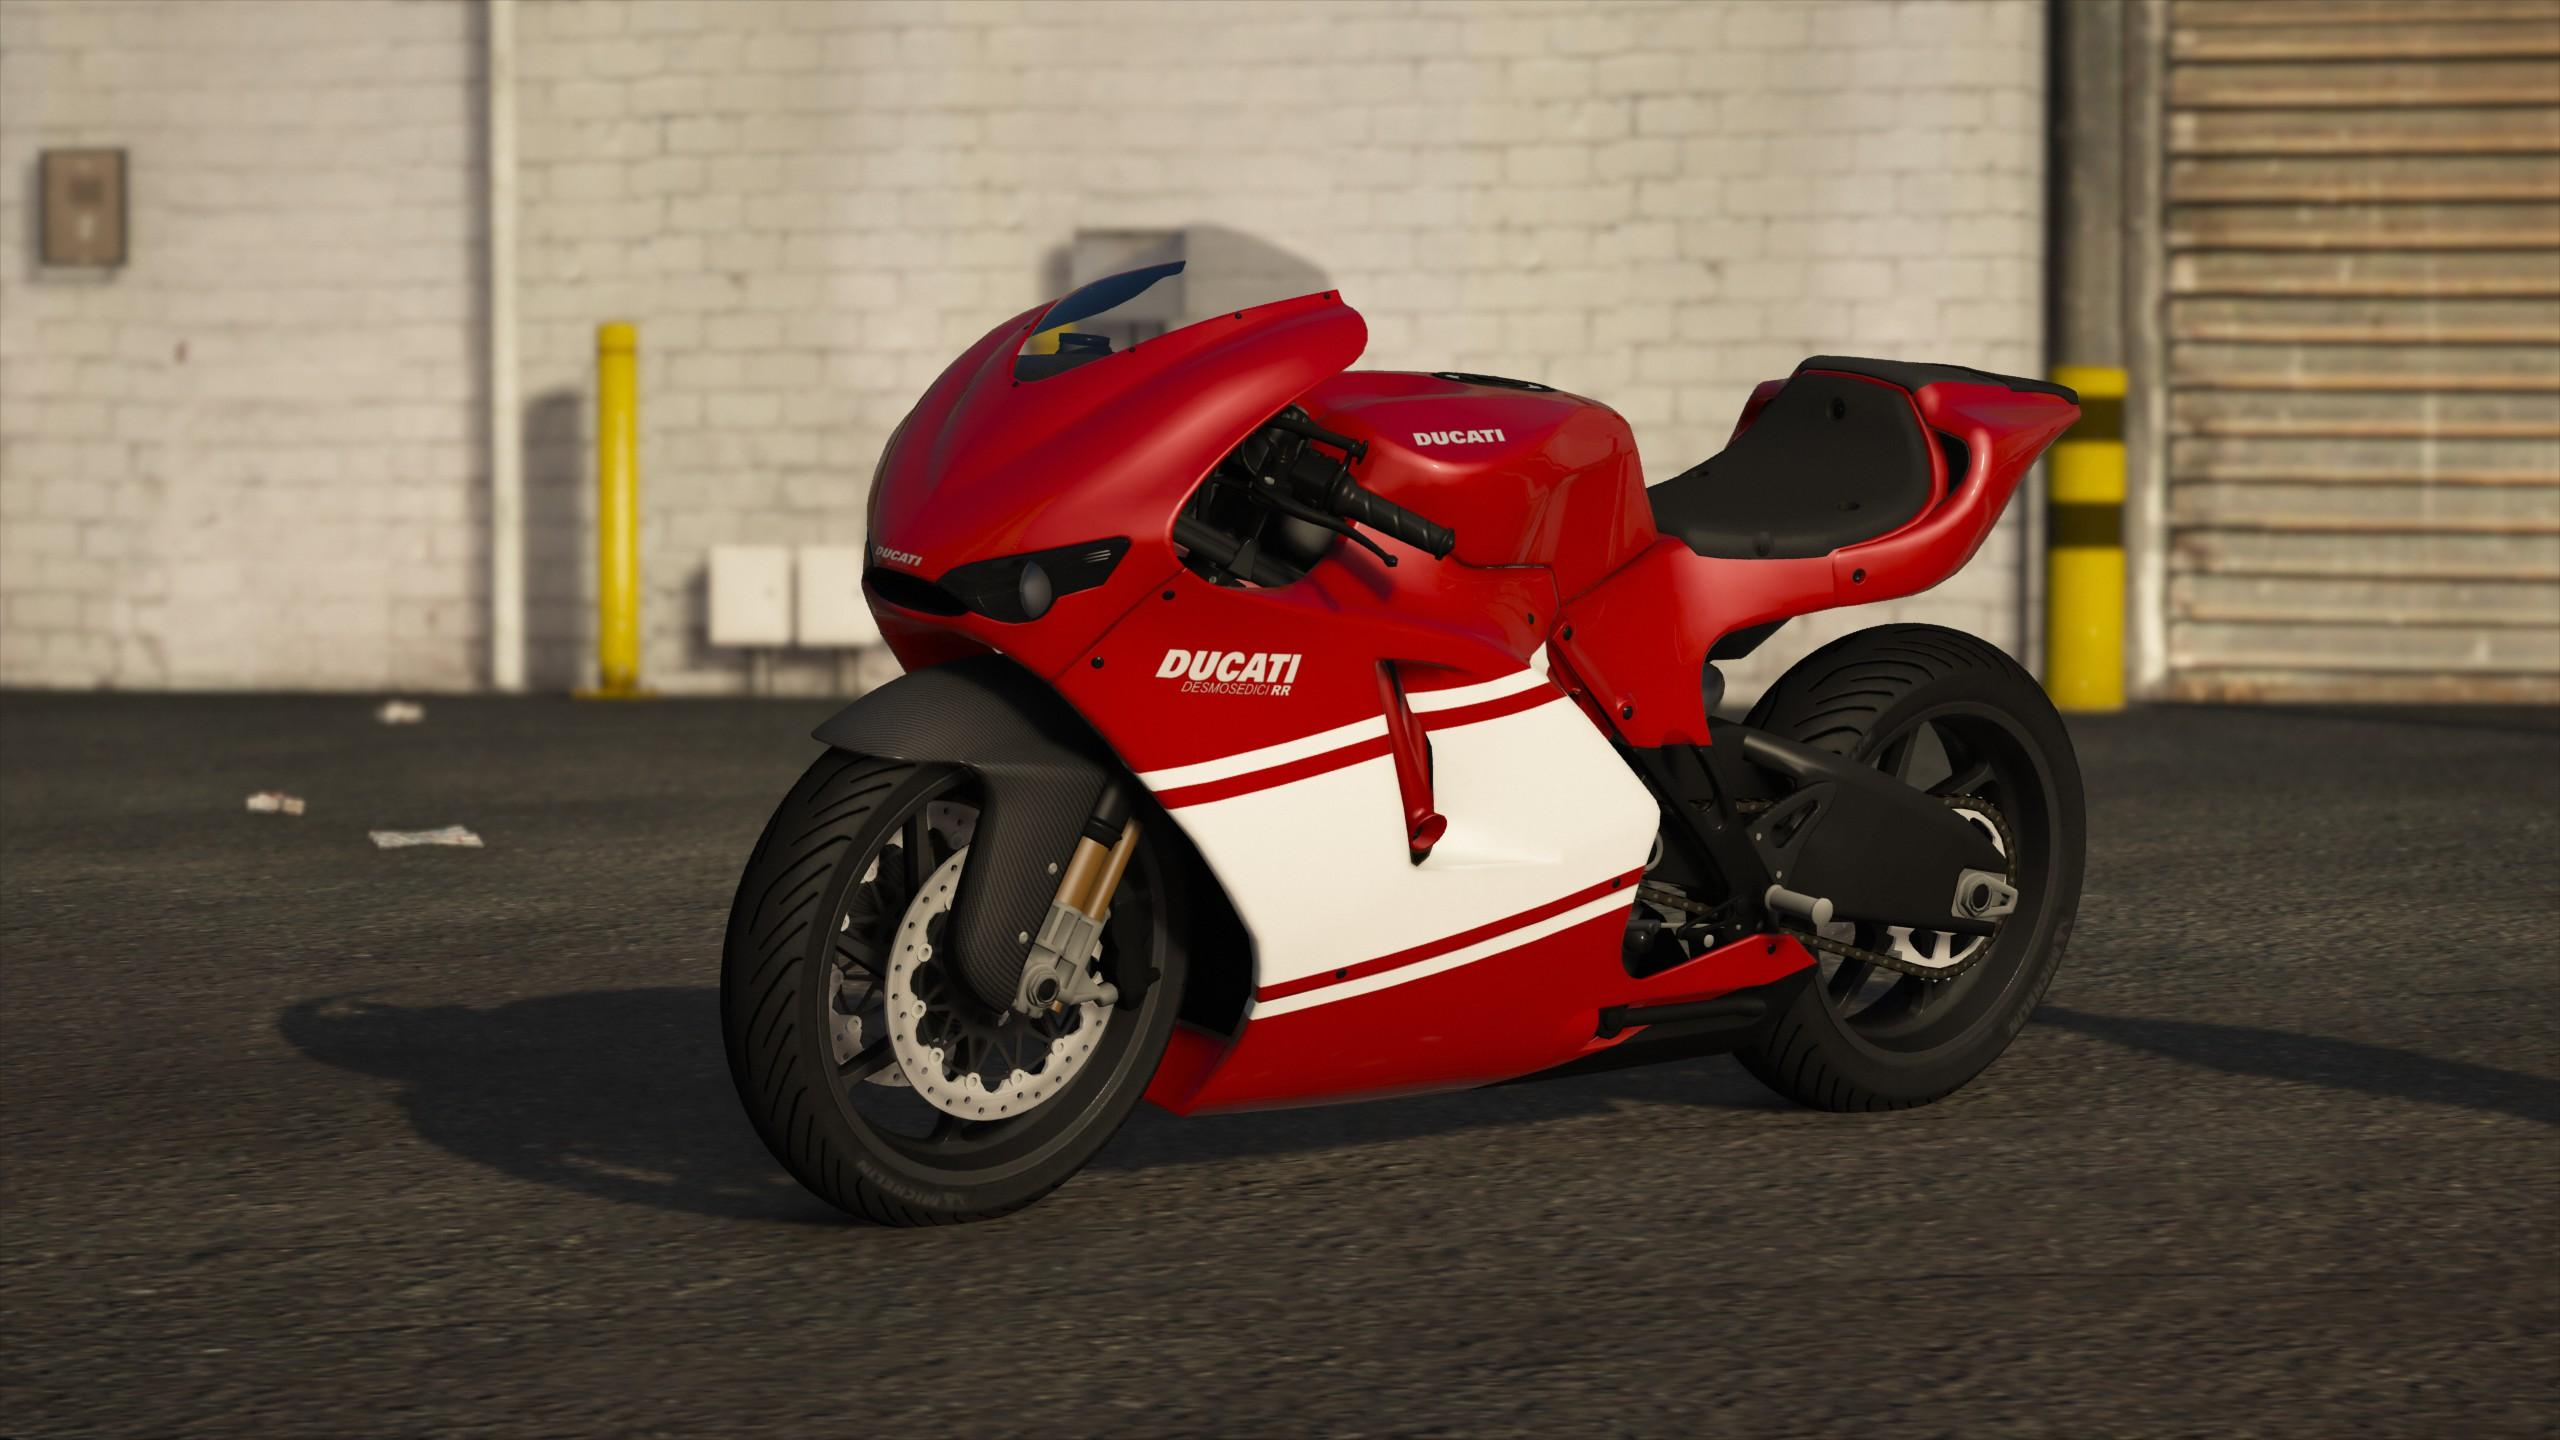 2012 Ducati Desmosedici Add On Tuning Liveries